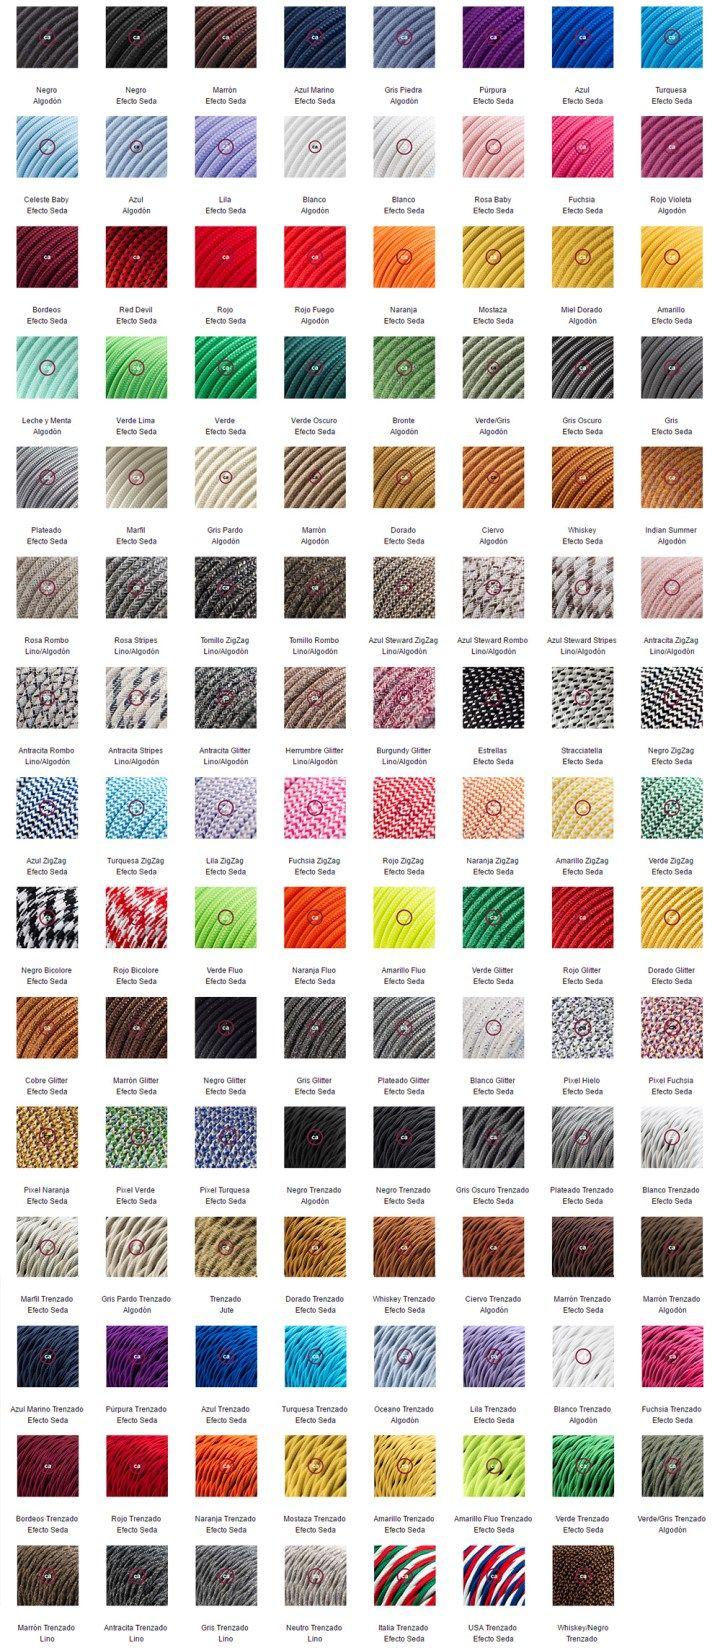 M s de 25 ideas fant sticas sobre dise o interior italiano - Disenos textiles del mediterraneo ...